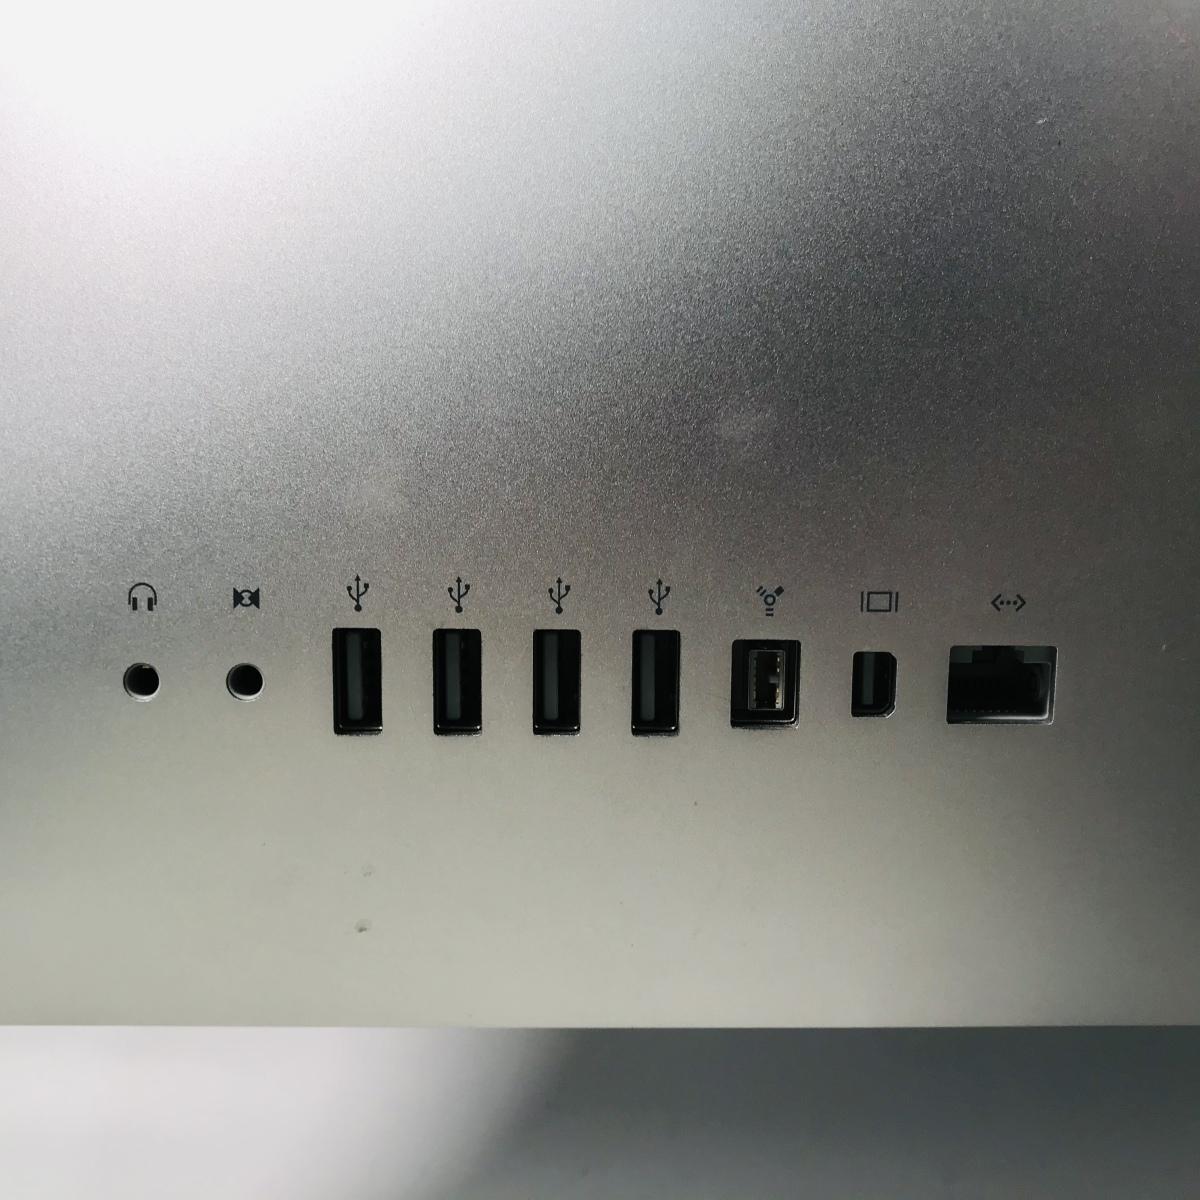 iMac 21.5インチ(Mid 2010) Core i3 3.2GHz/4GB/1TB MC509J/A 動作確認済み_画像6